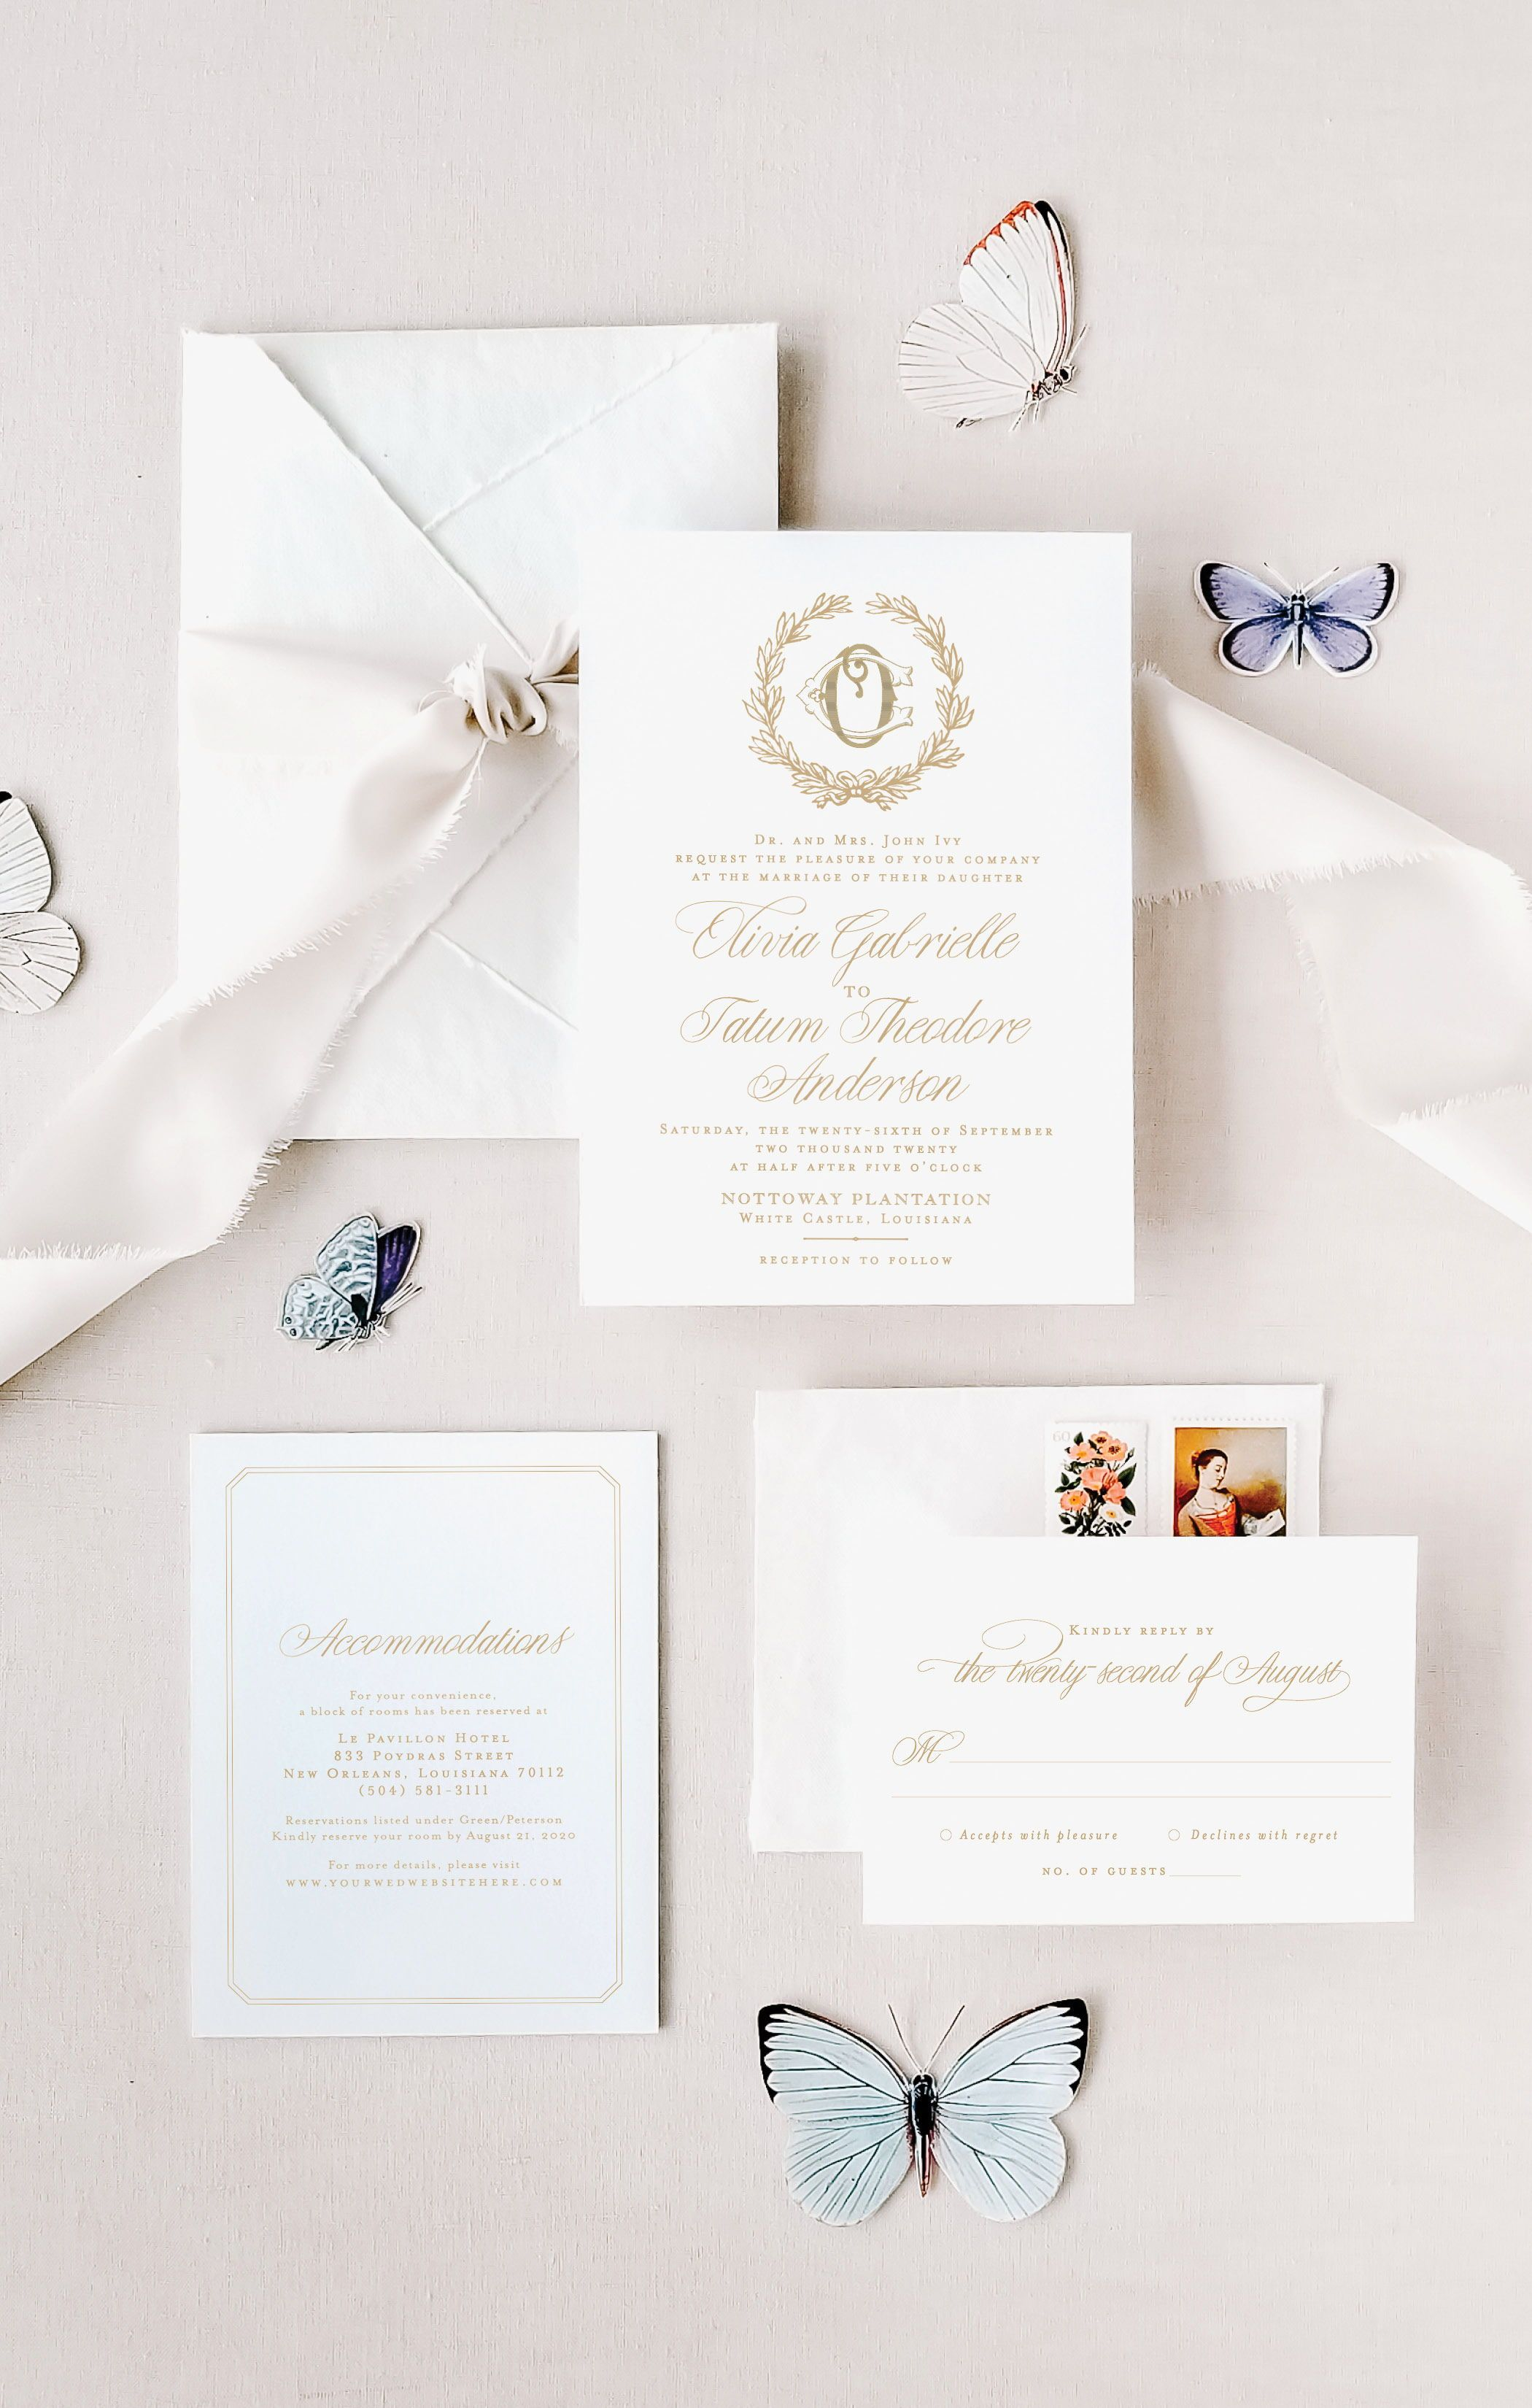 Classic Wedding Invitations In 2020 Classic Wedding Invitations Floral Wedding Invitations Watercolor Floral Wedding Invitations